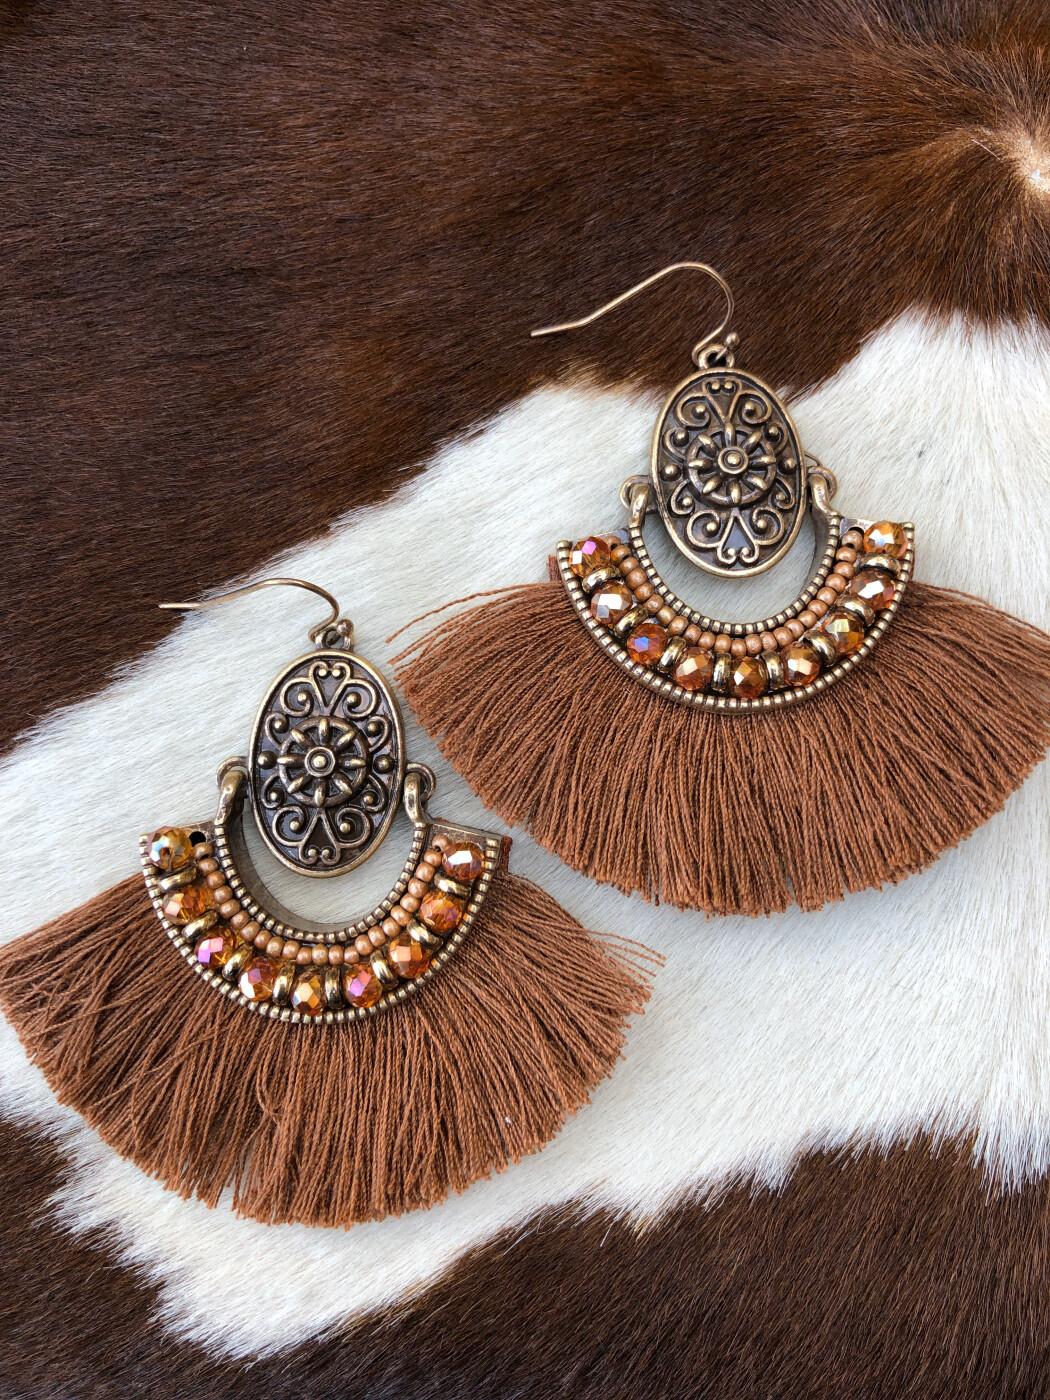 Brown boho tassel earrings